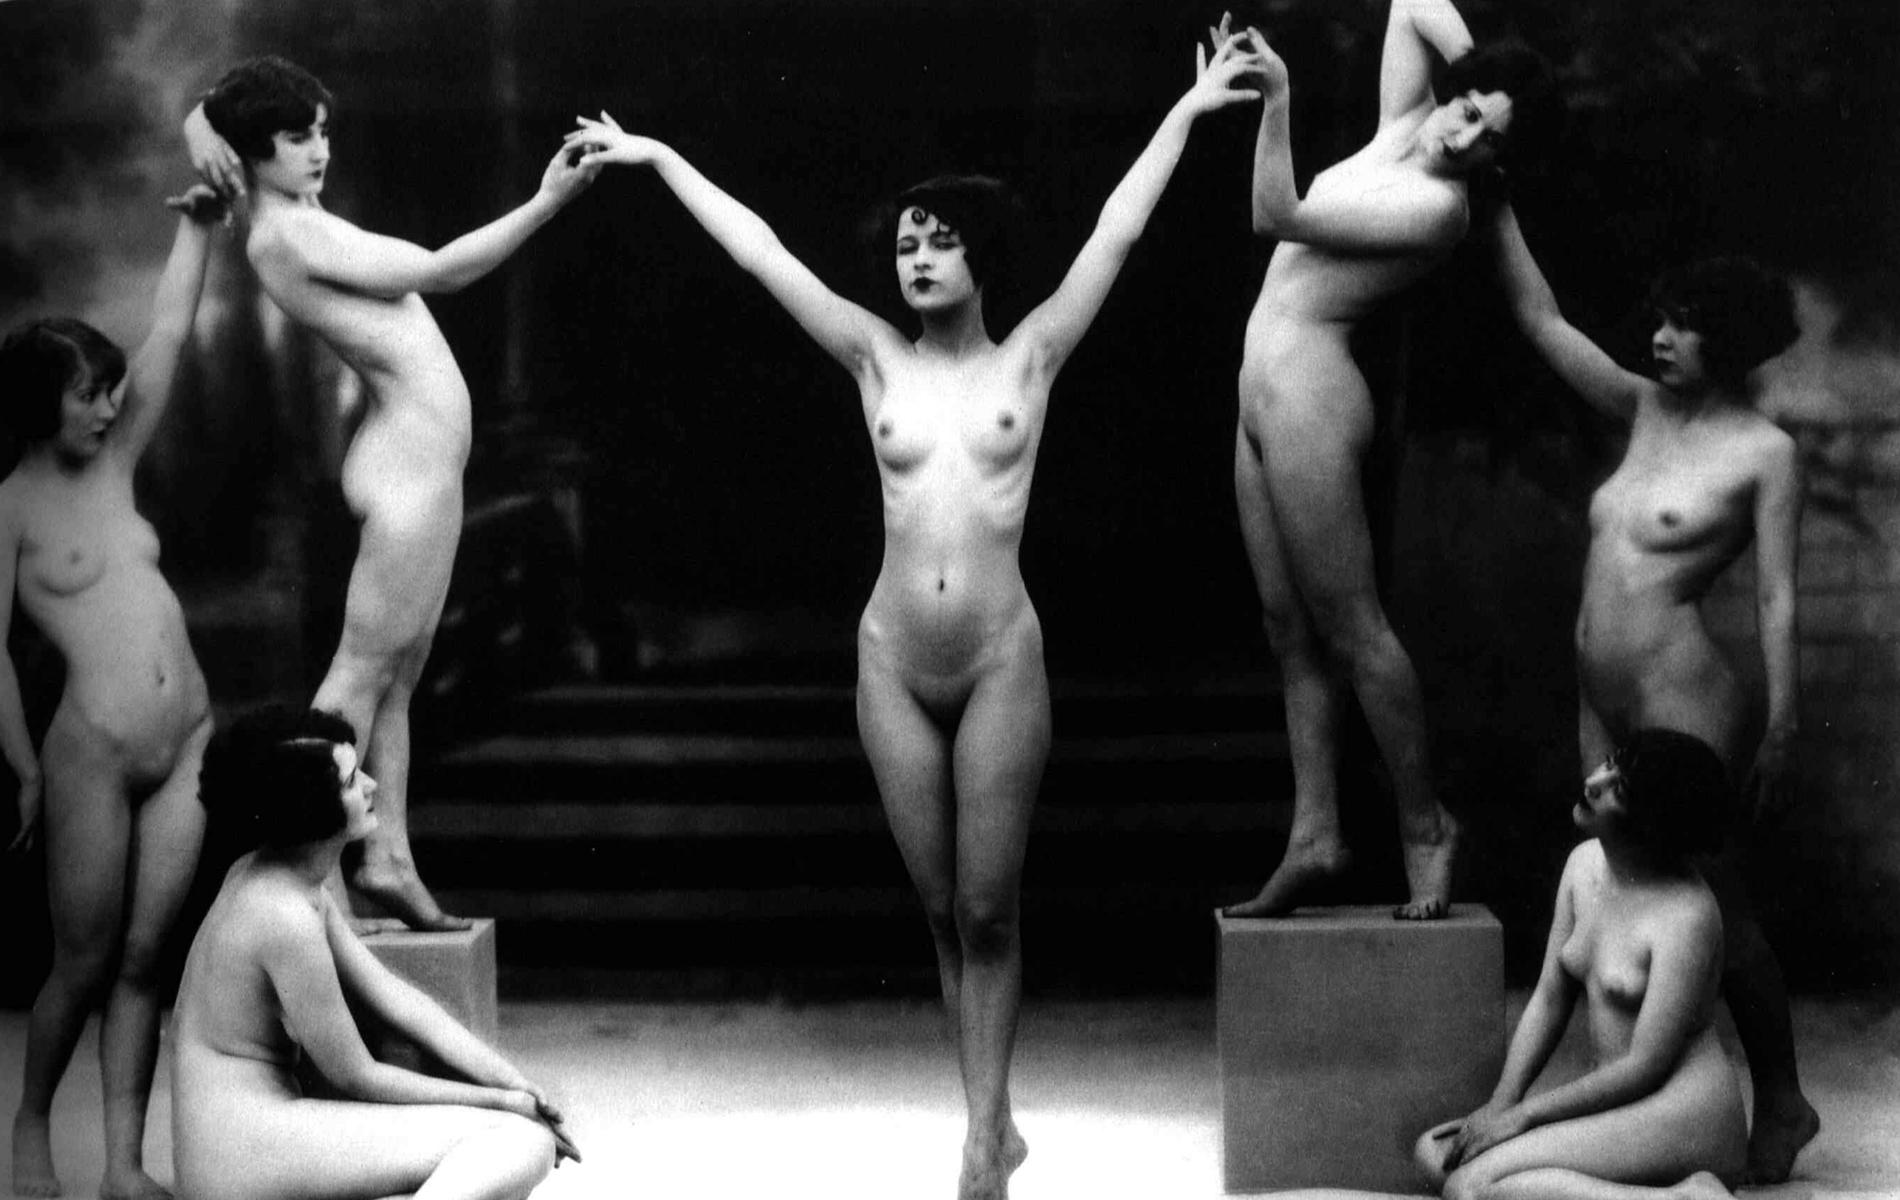 Nude erotic dance cartoon image